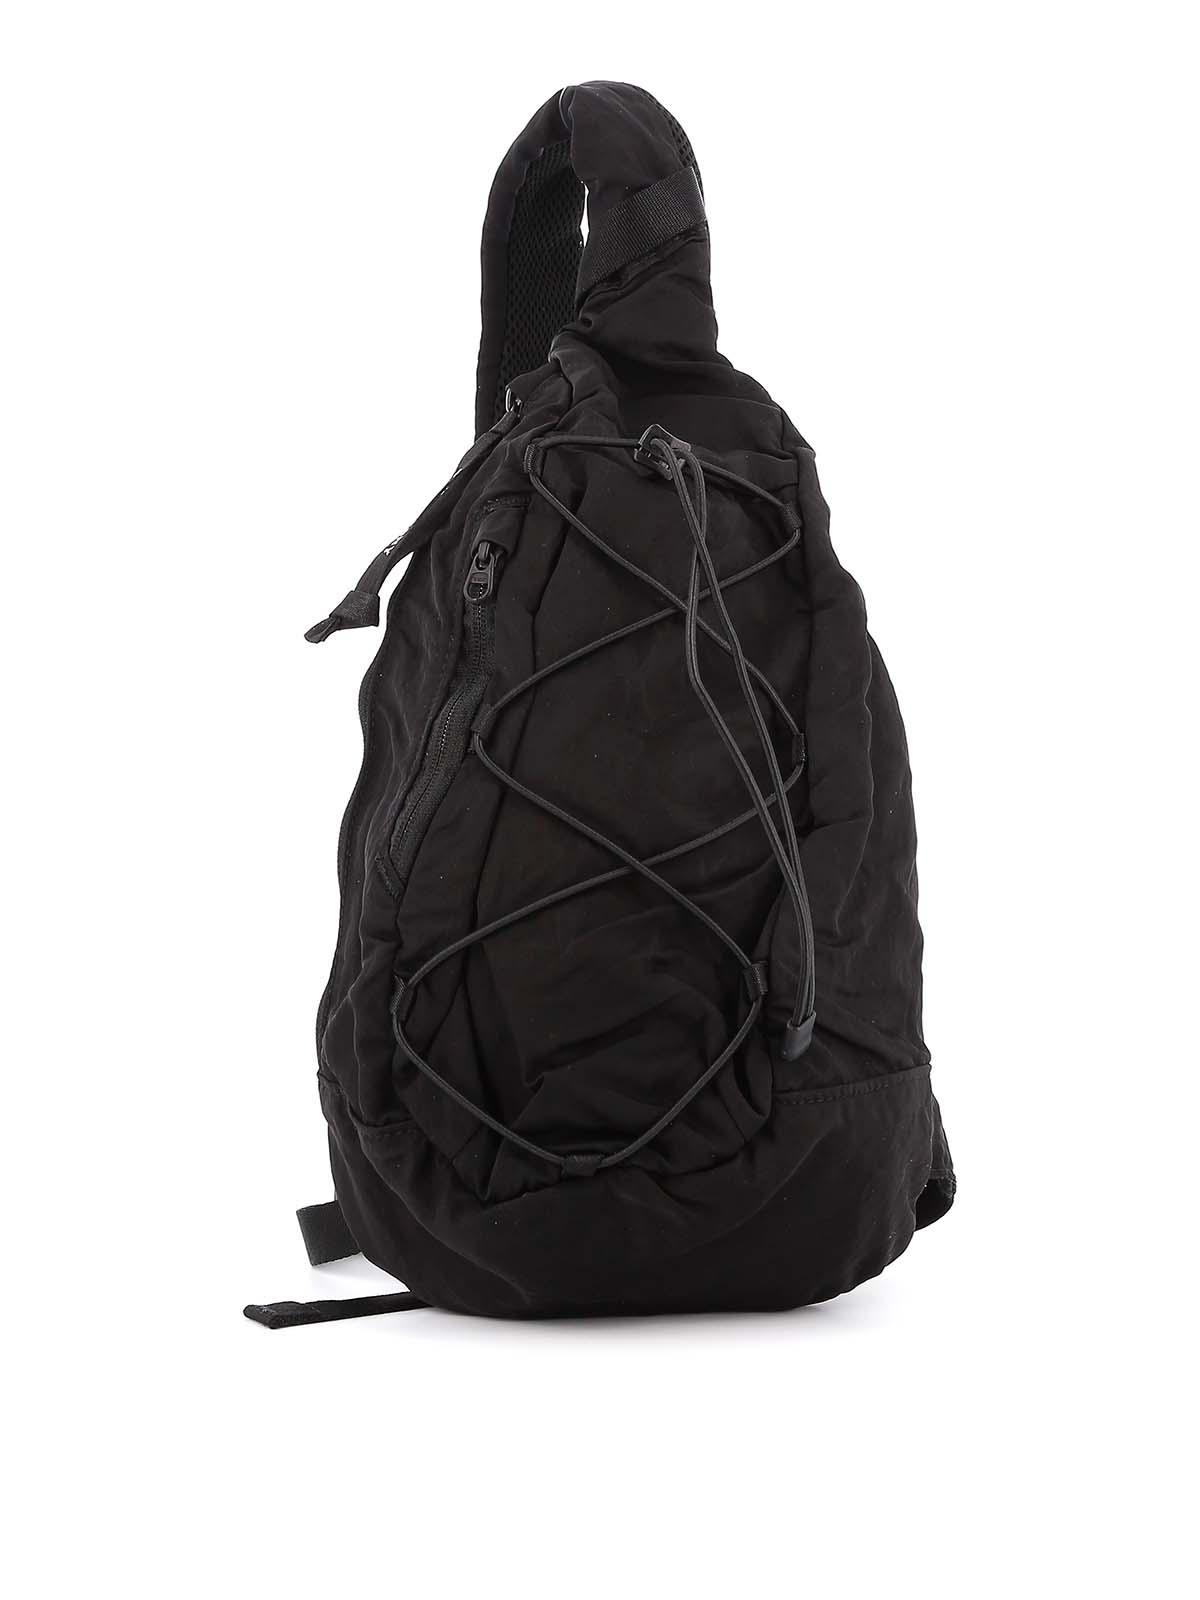 C.P. Company Black Nylon One Shoulder Backpack